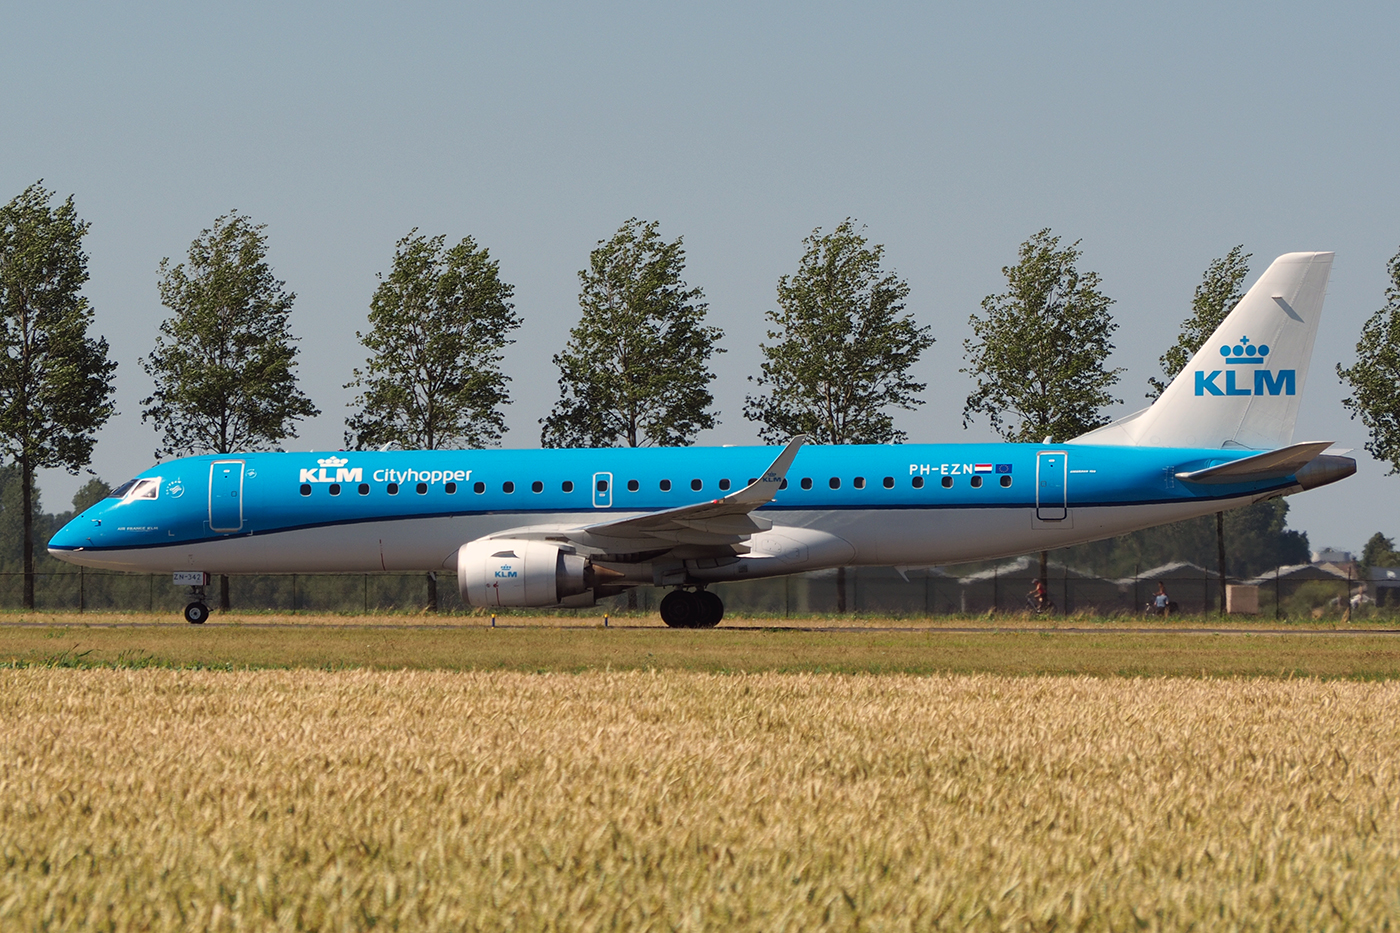 PH-EZN, KLM cityhopper, Embraer 190